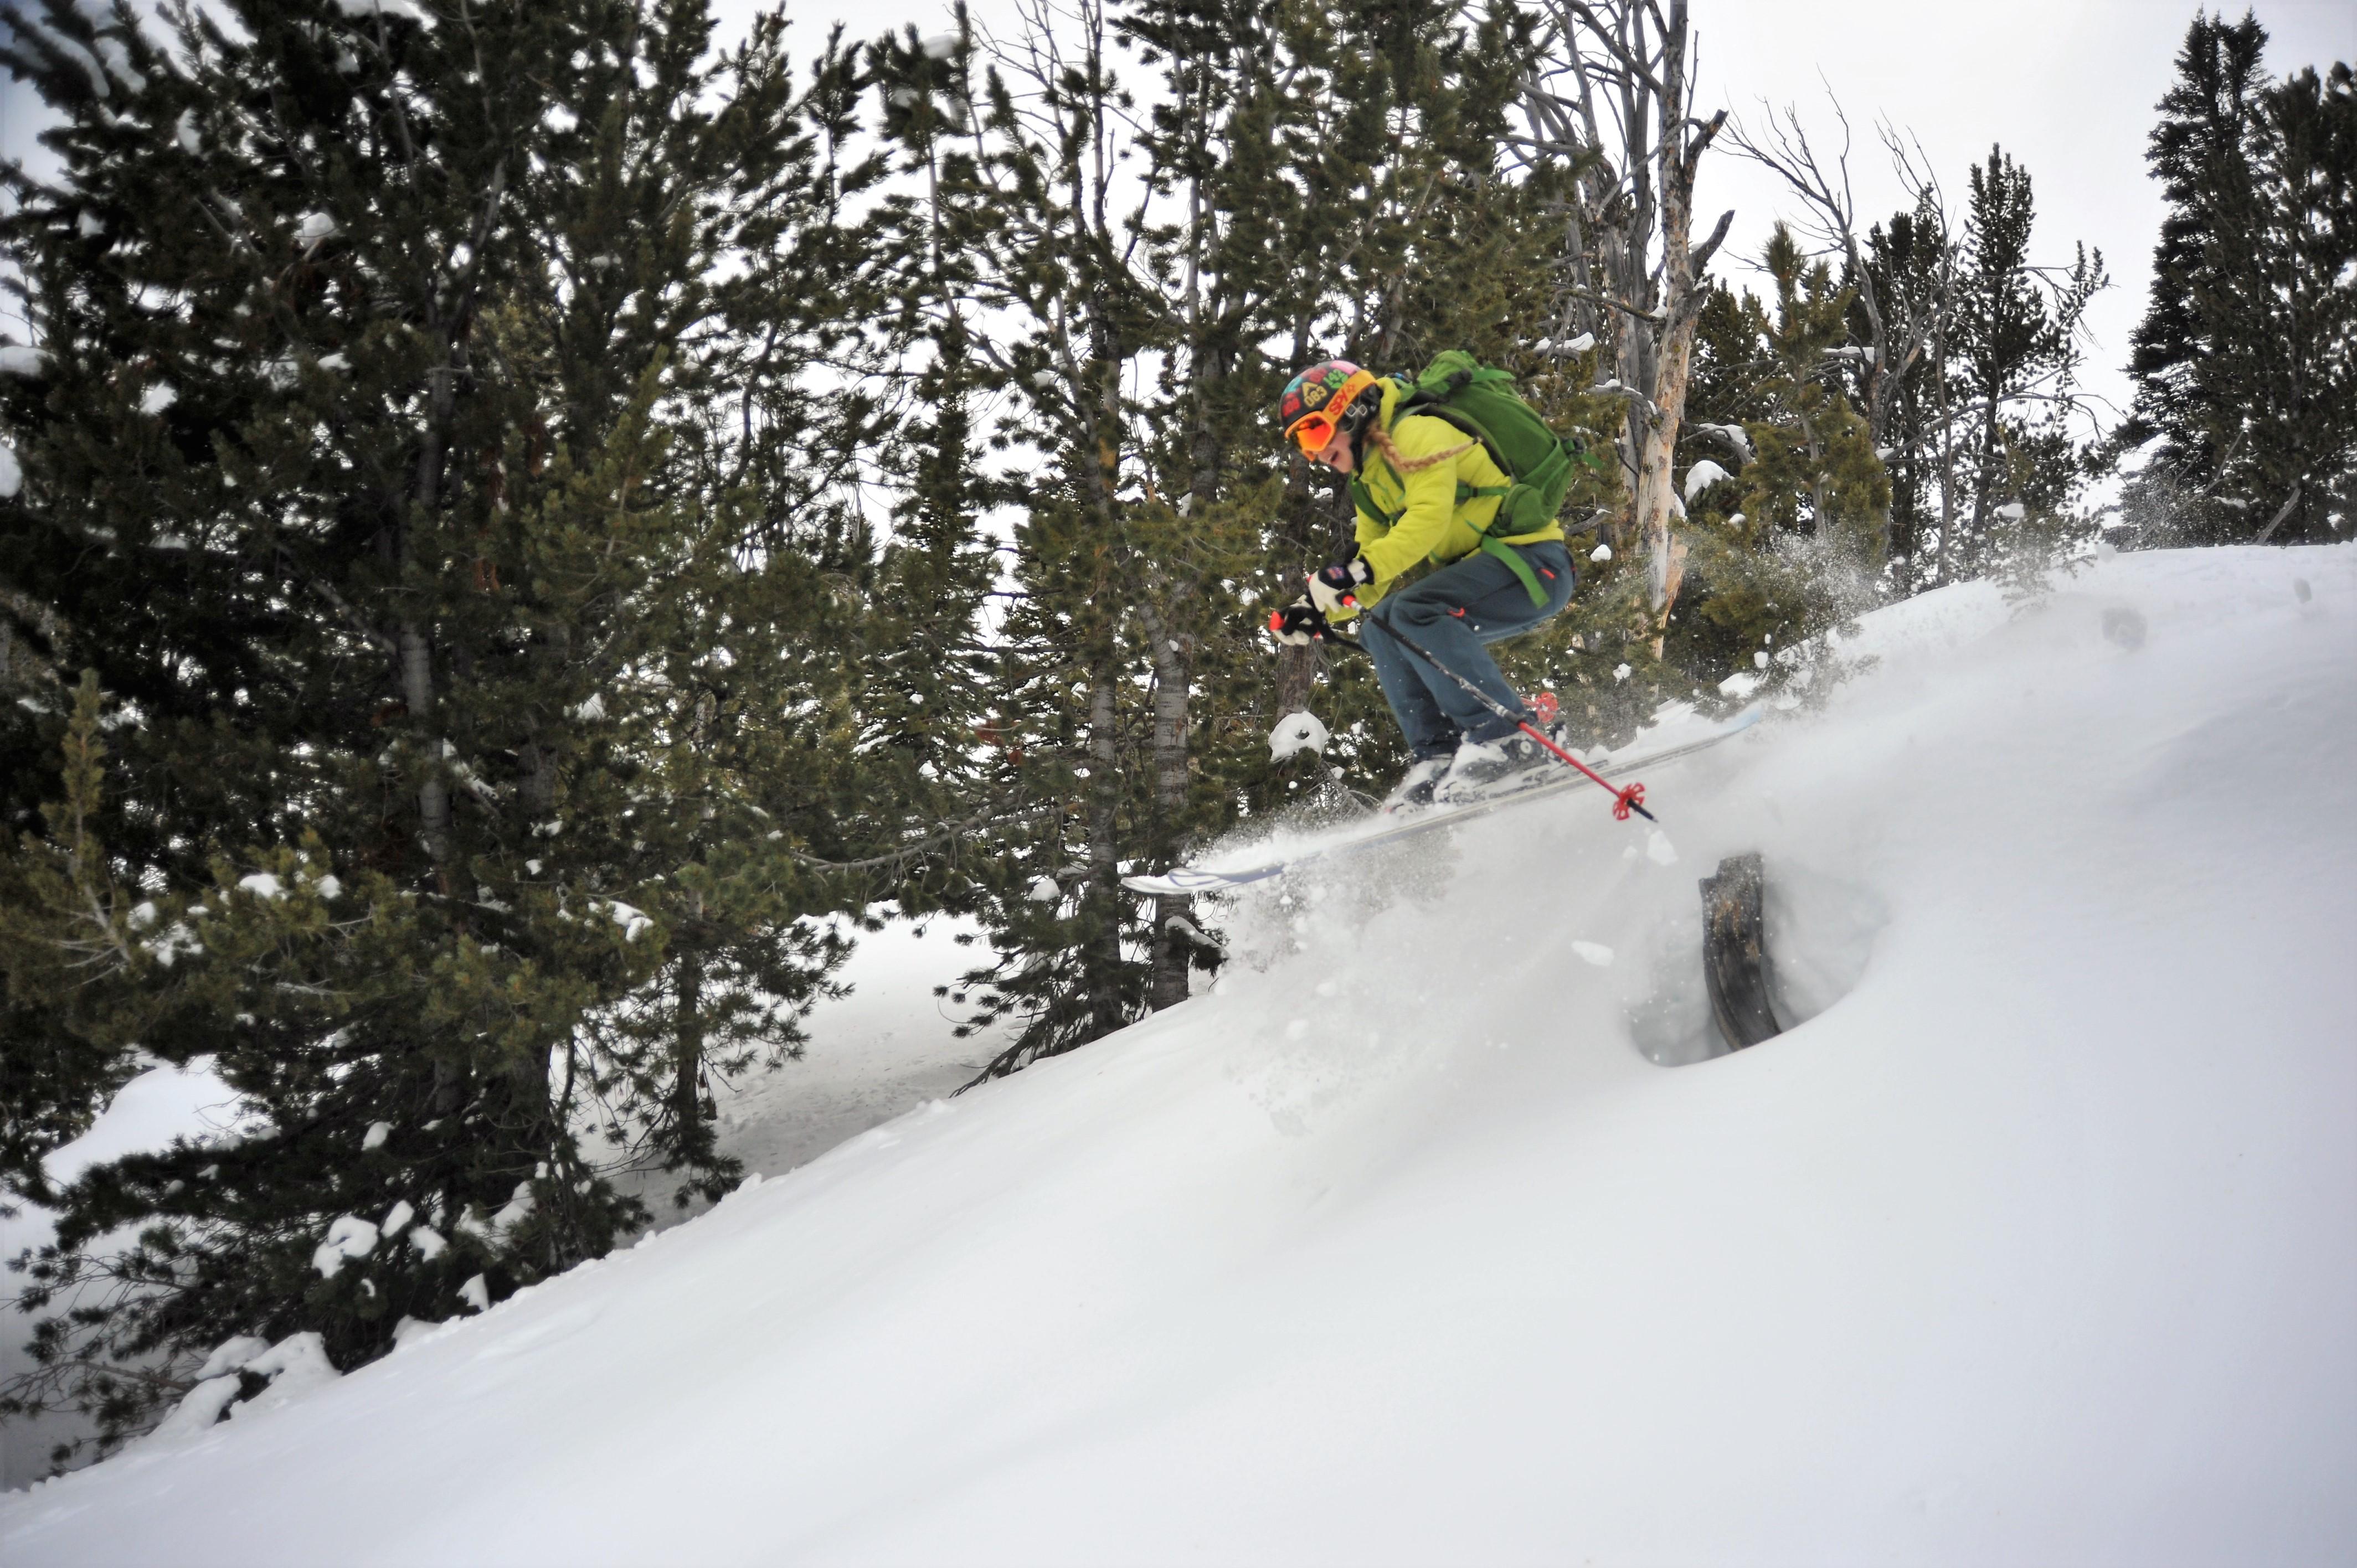 01skilist | Outdoor Recreation | Snow